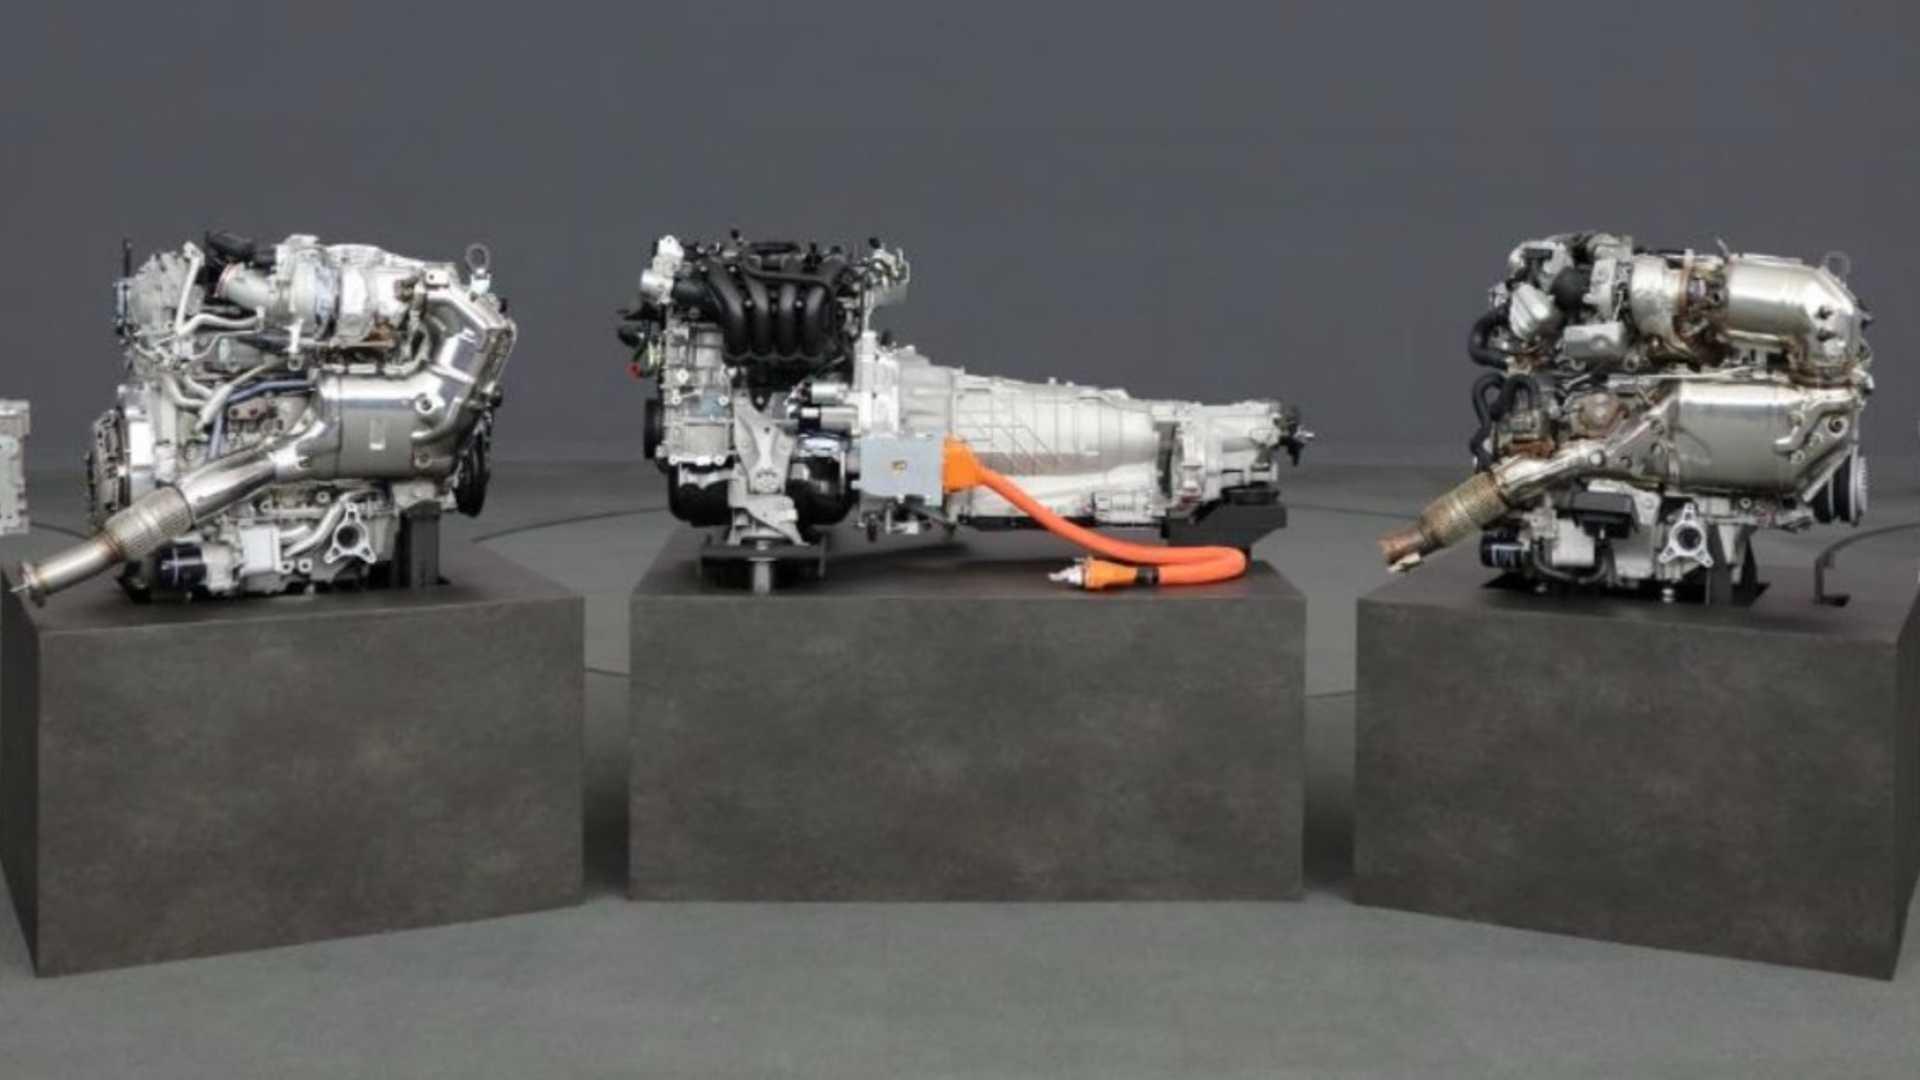 MAZDA特立独行重启六缸引擎